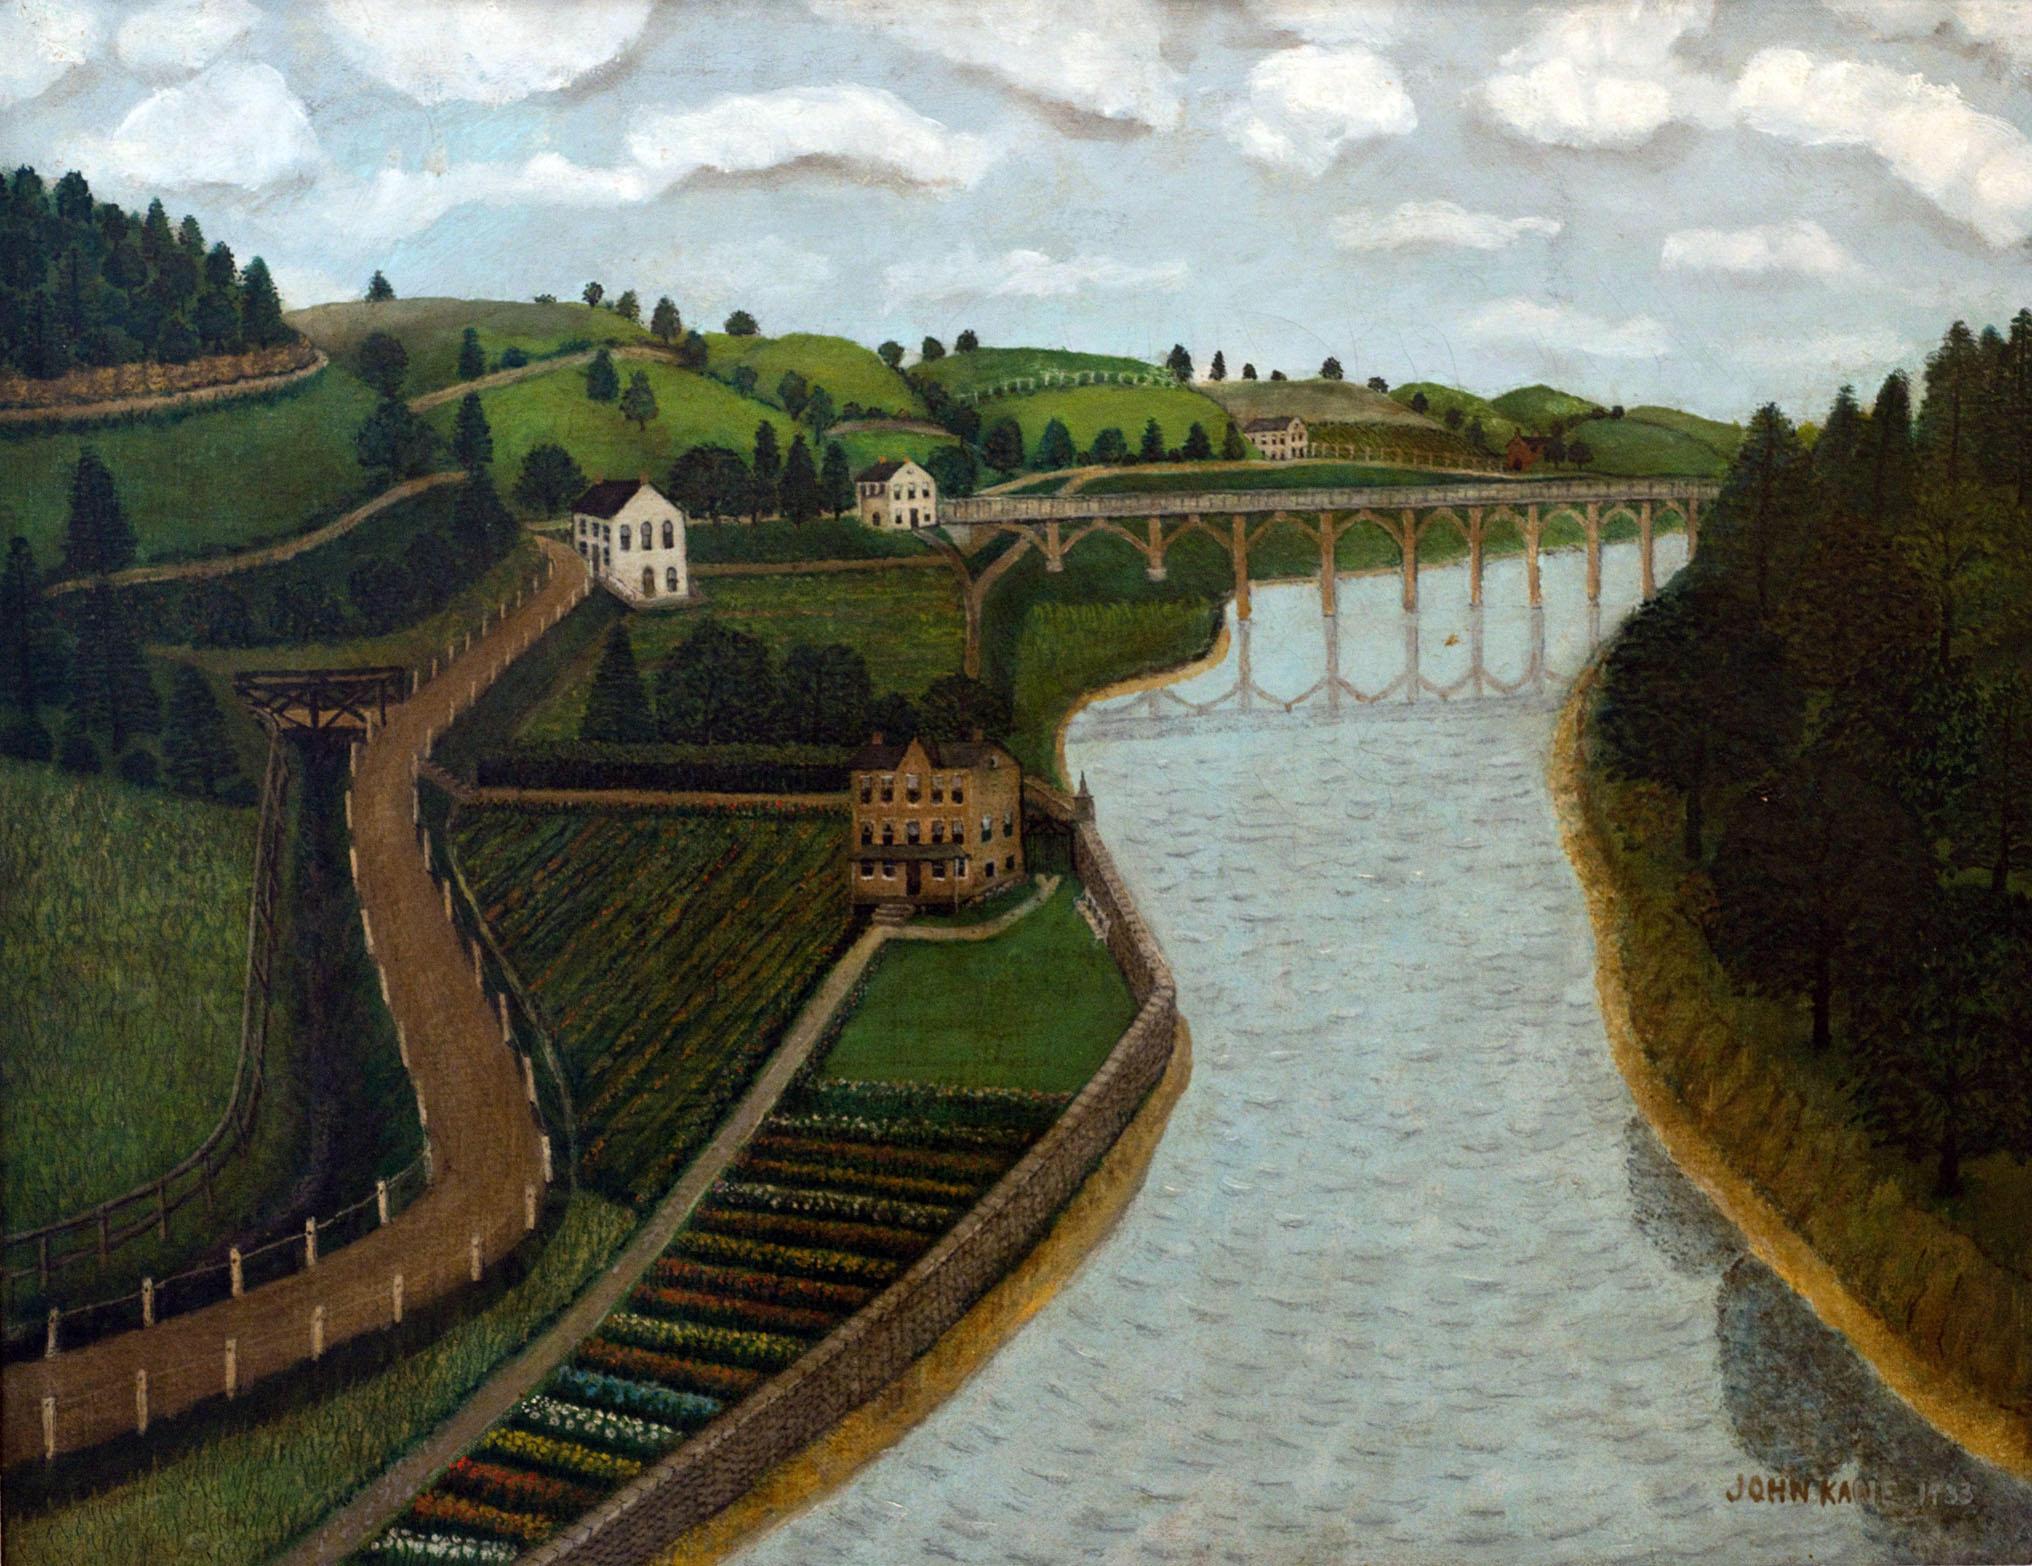 Folk Artist John Kane's Work Exhibited at the Westmoreland Museum